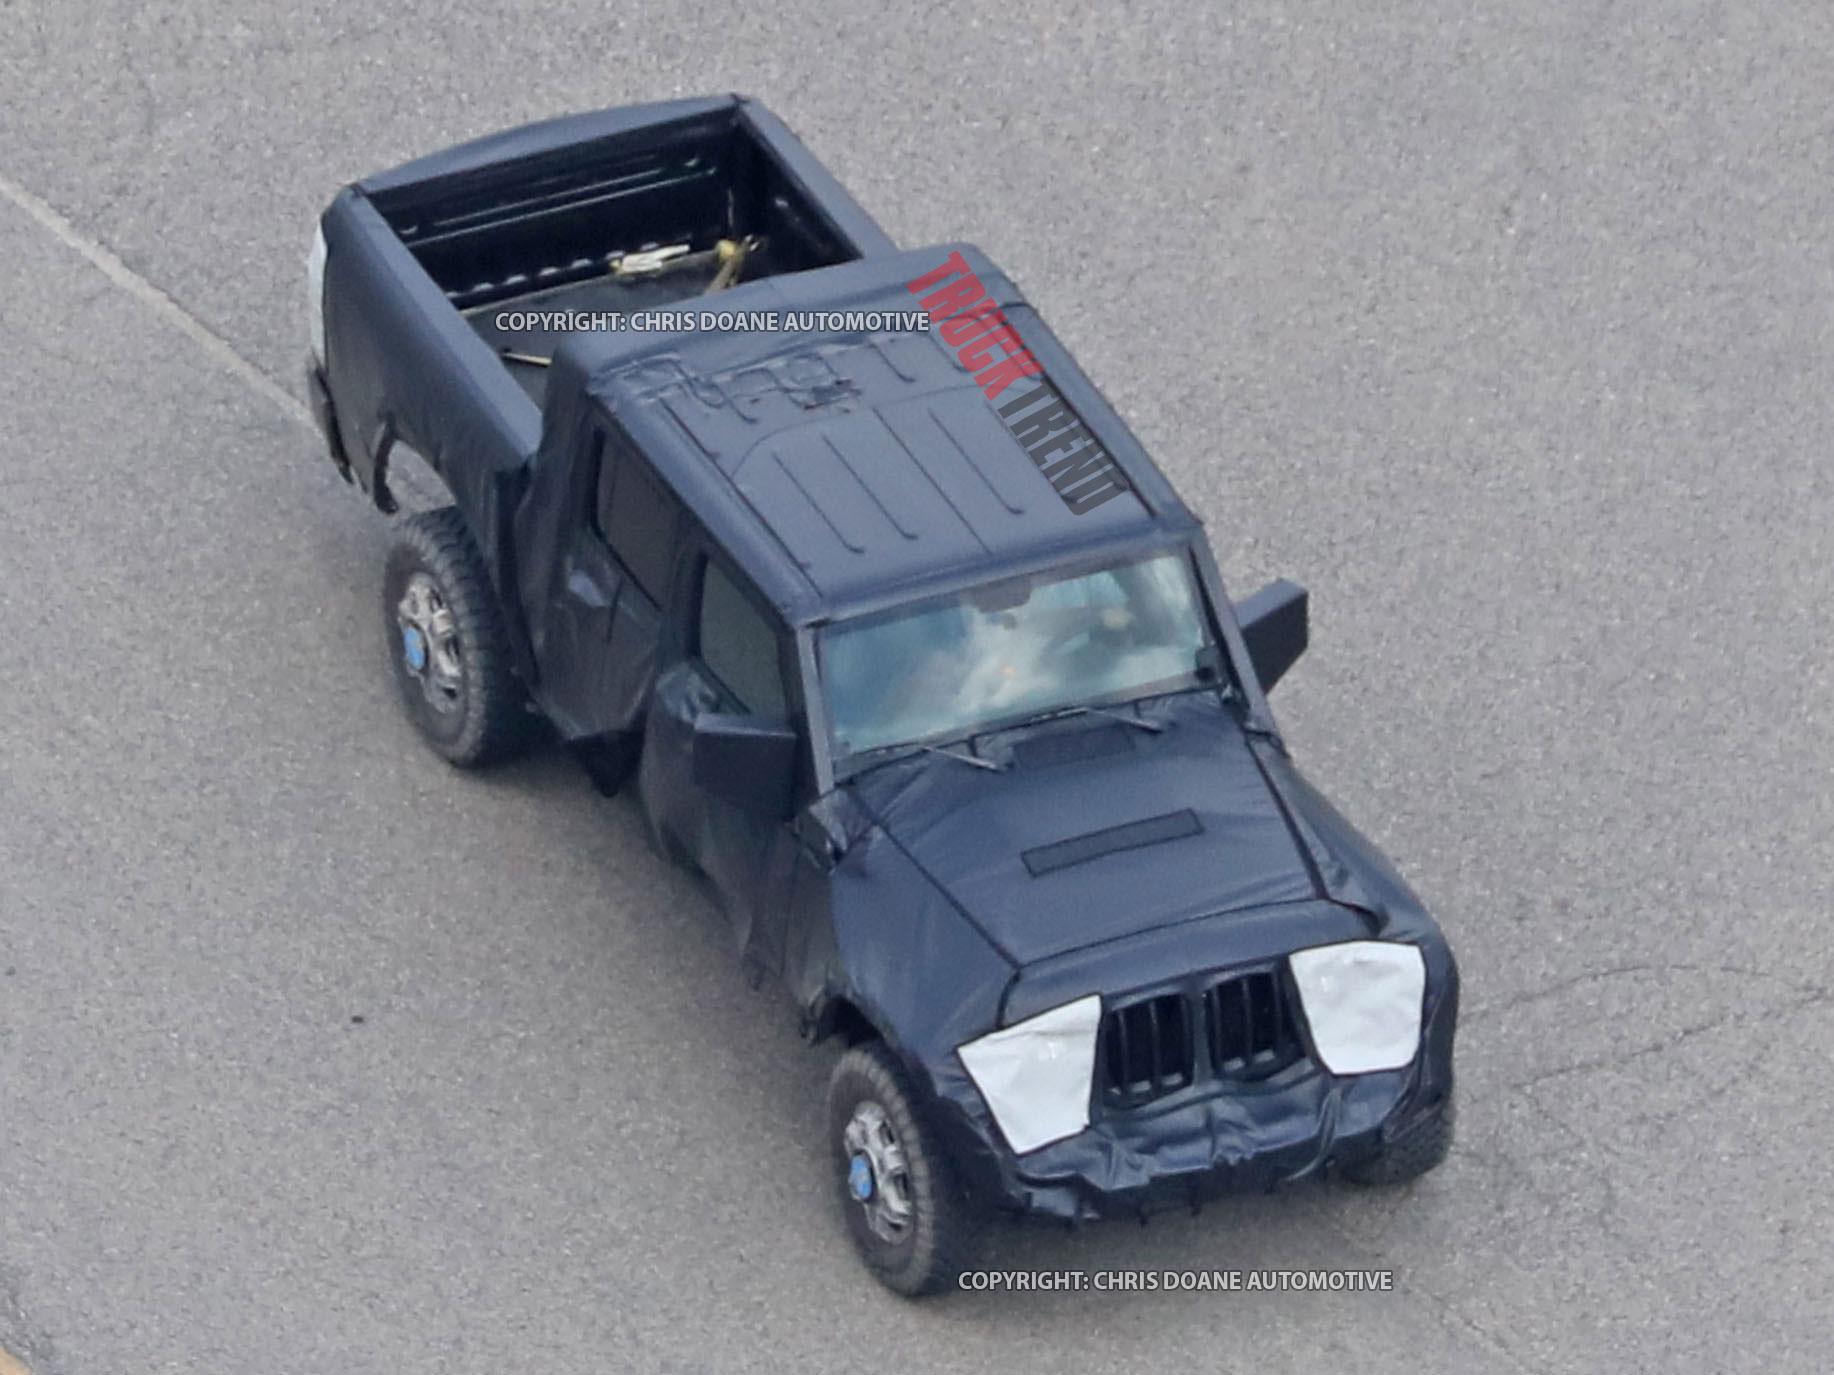 2019 Jeep Wrangler JL Pickup Spyshots 03